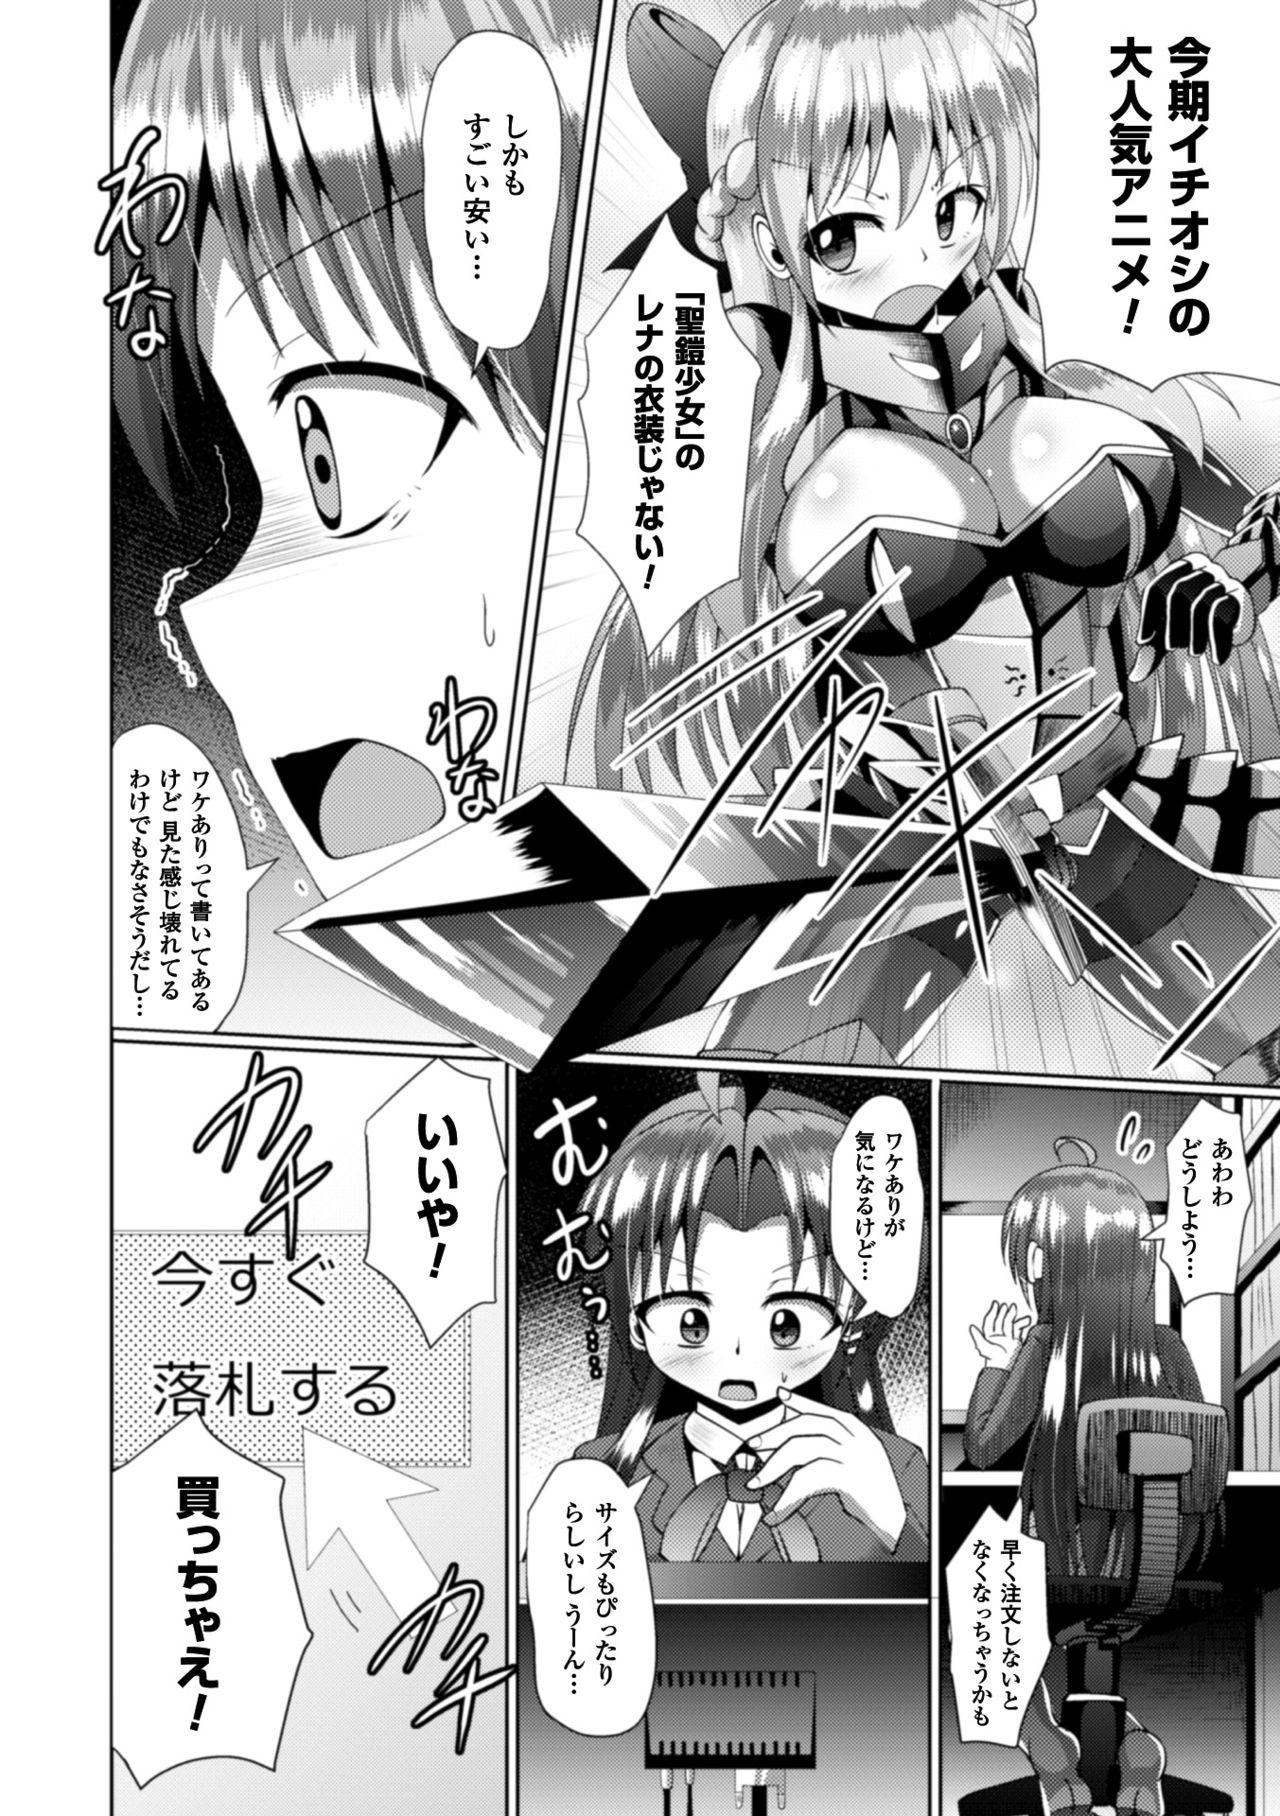 2D Comic Magazine Shokushu Yoroi ni Zenshin o Okasare Mugen Zecchou! Vol. 5 79